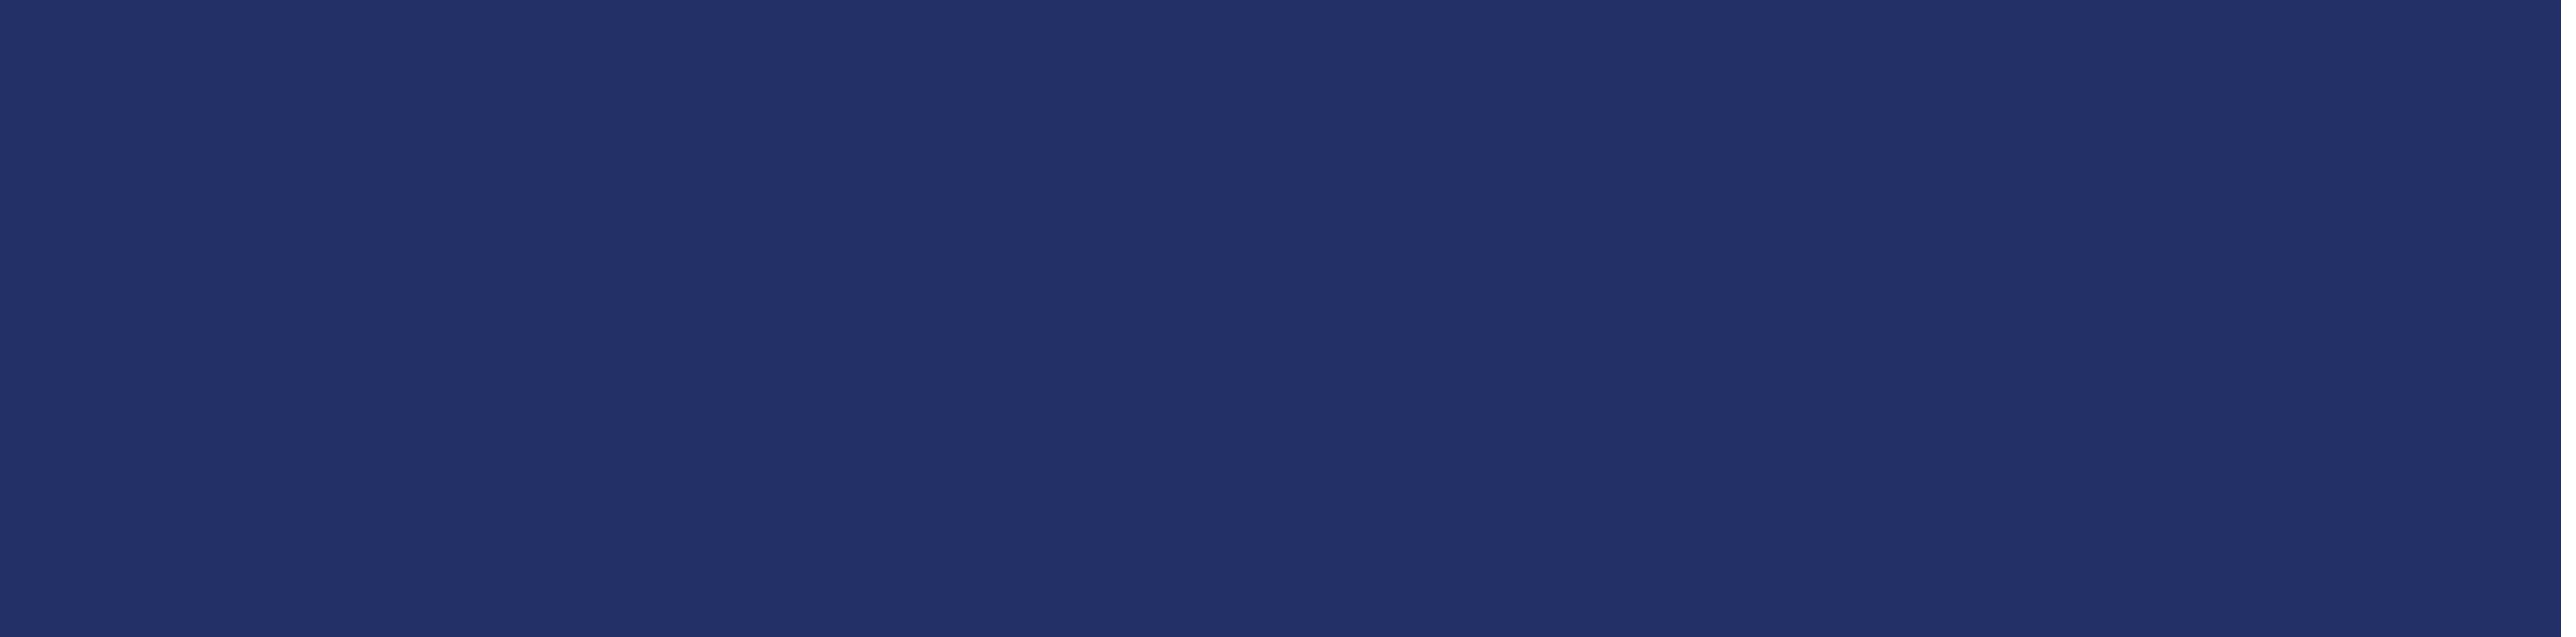 Aquablu |  Water Filter System